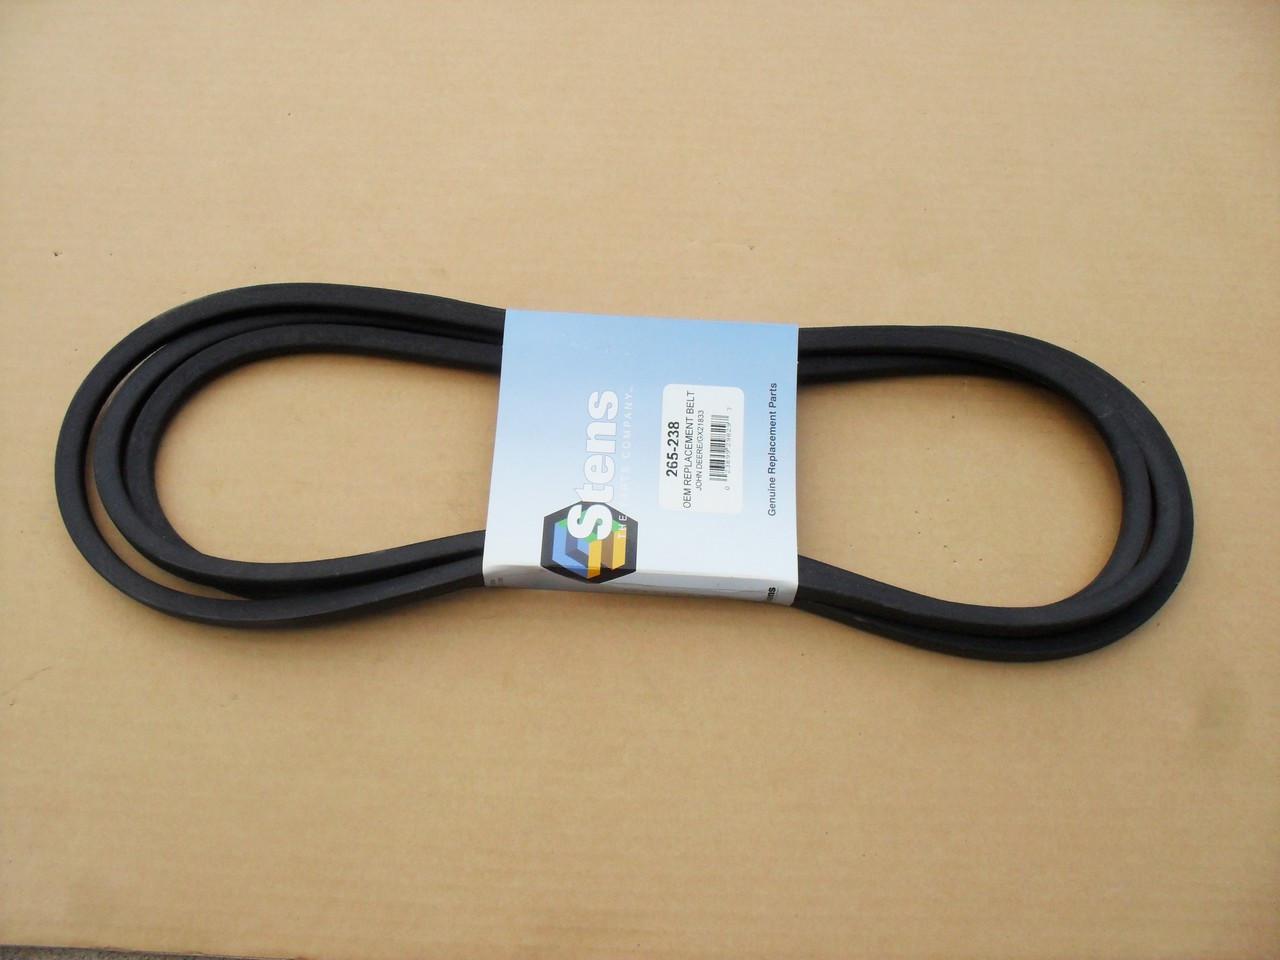 Deck Belt For John Deere D140 D150 D160 L120 L130 L145 L155. Deck Belt For John Deere D140 D150 D160 L120 L130 L145. John Deere. John Deere 48 Inch Deck Belt Diagram L145 At Scoala.co